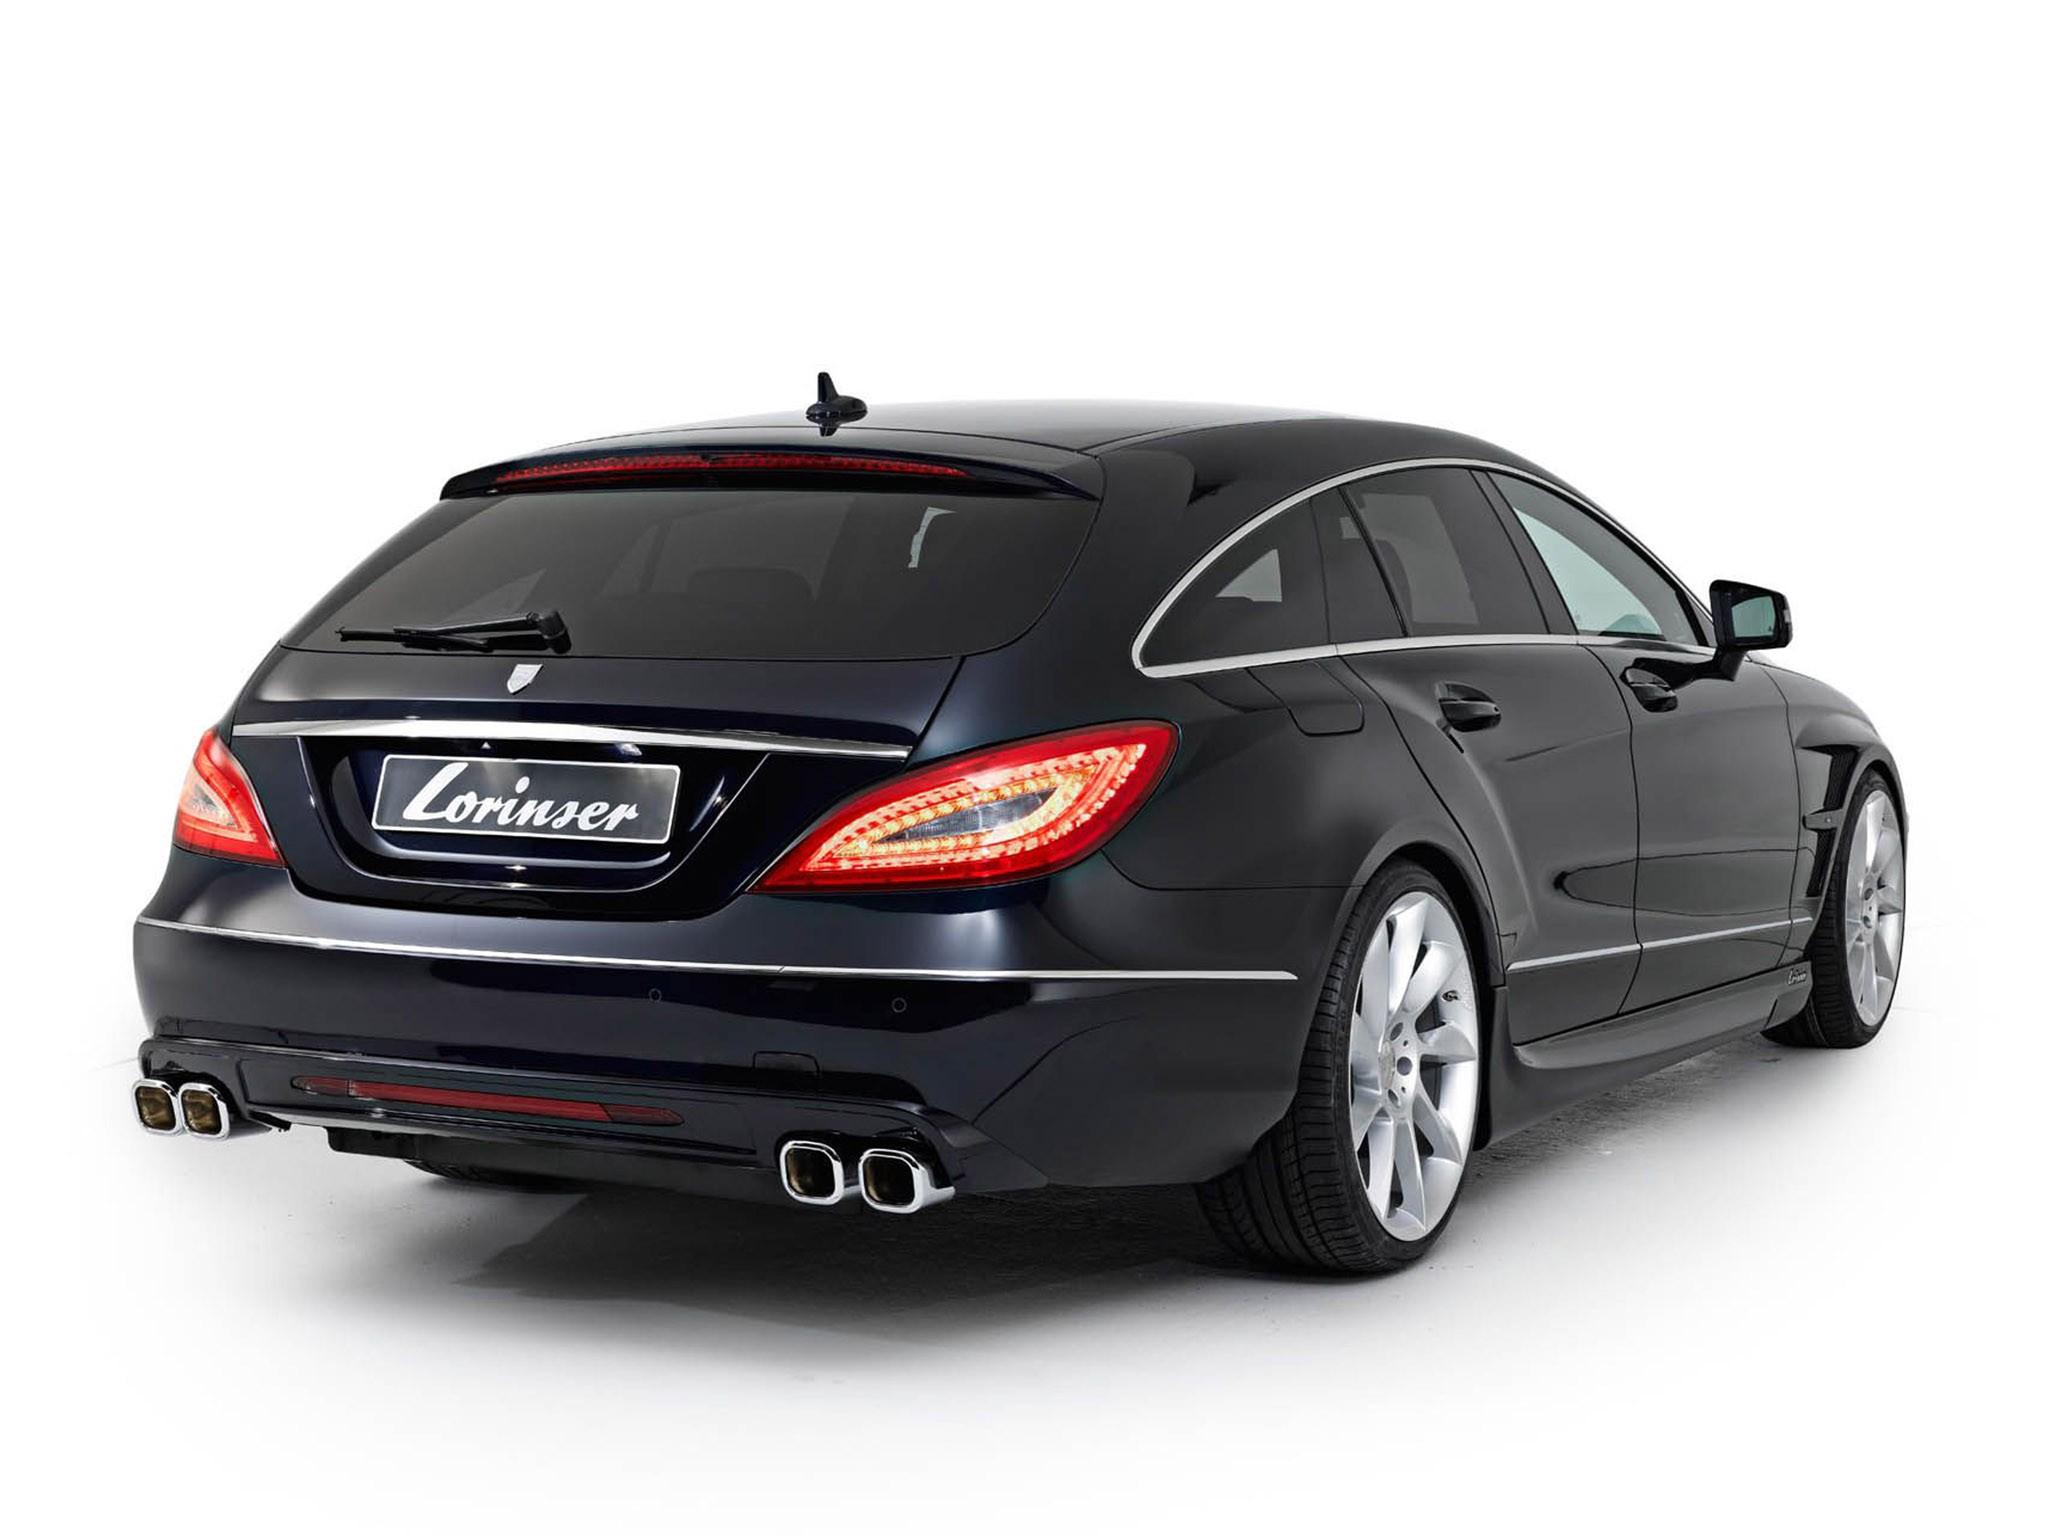 2013 Lorinser Mercedes CLS Shooting Brake